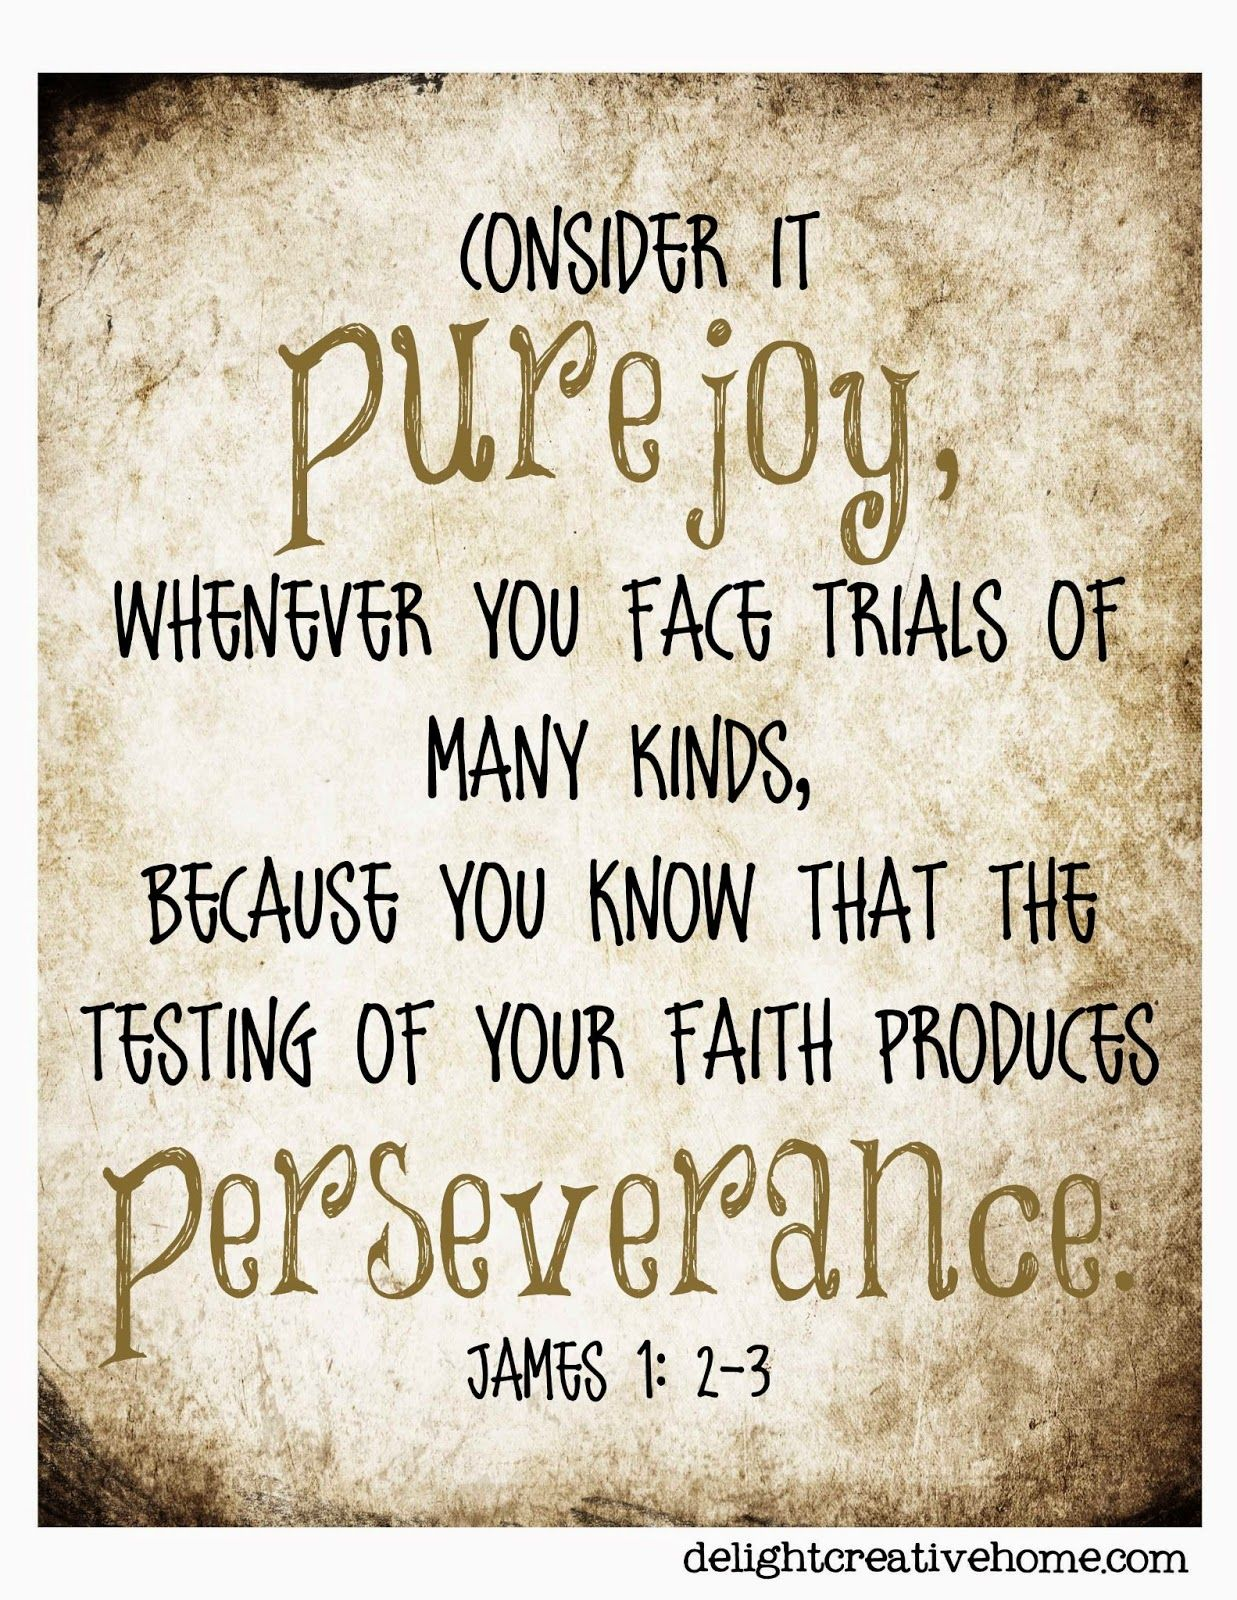 Phantasy Perseverance James Perseverance James Inspiration Pinterest Bible Verse About Joy Niv Bible Verse About Joy Comes Morning inspiration Bible Verse About Joy